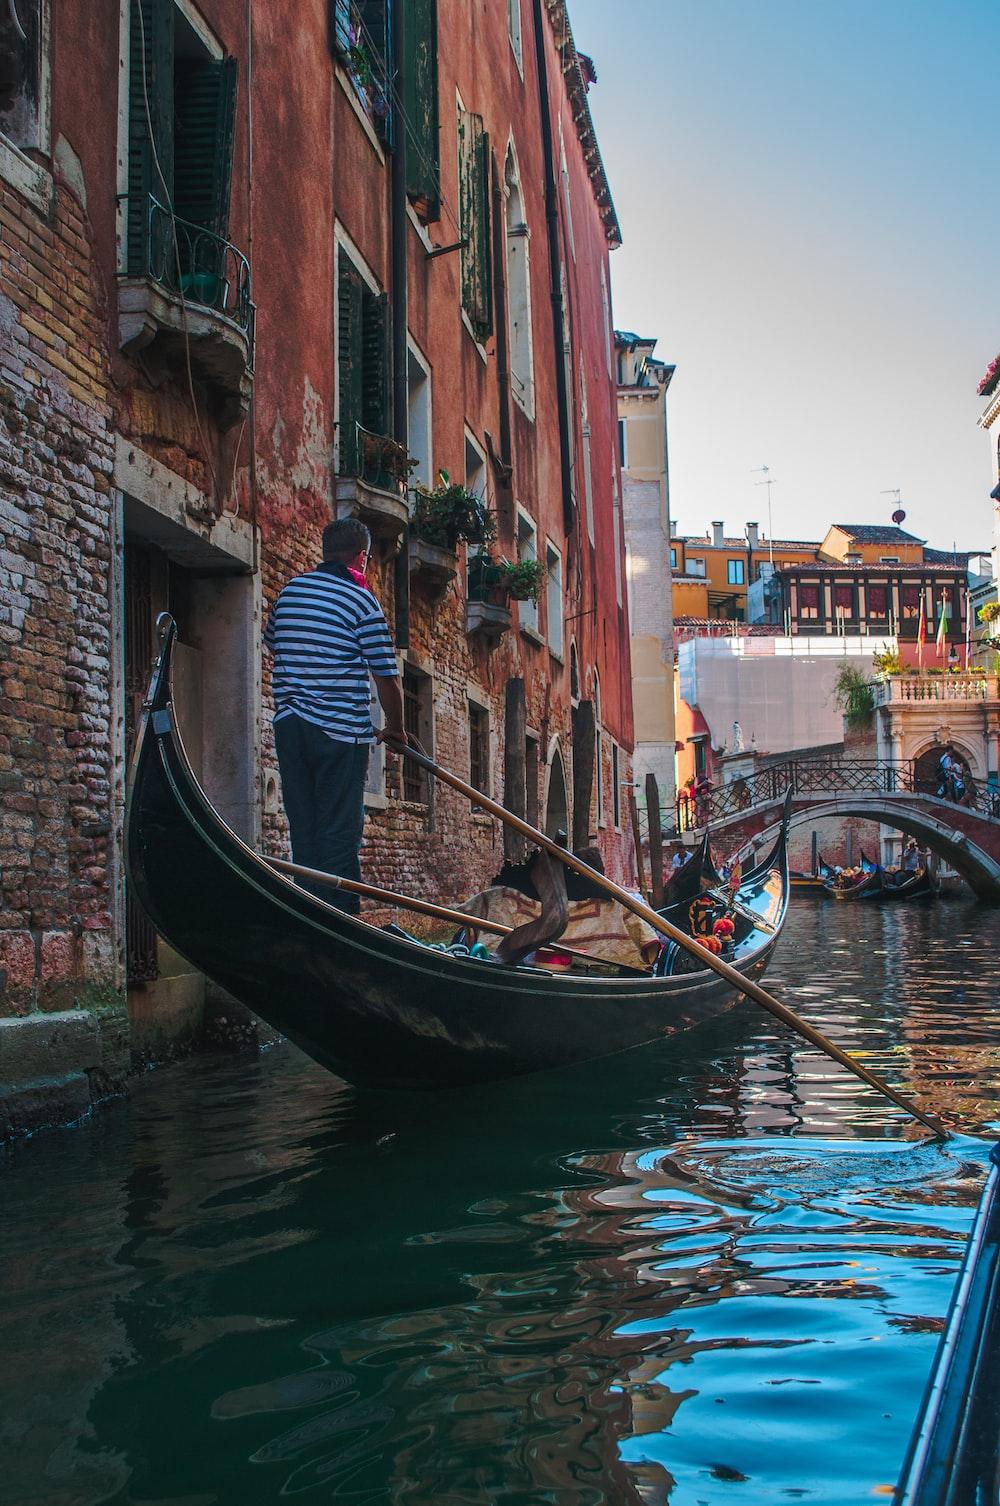 man riding boat at Venice Canal